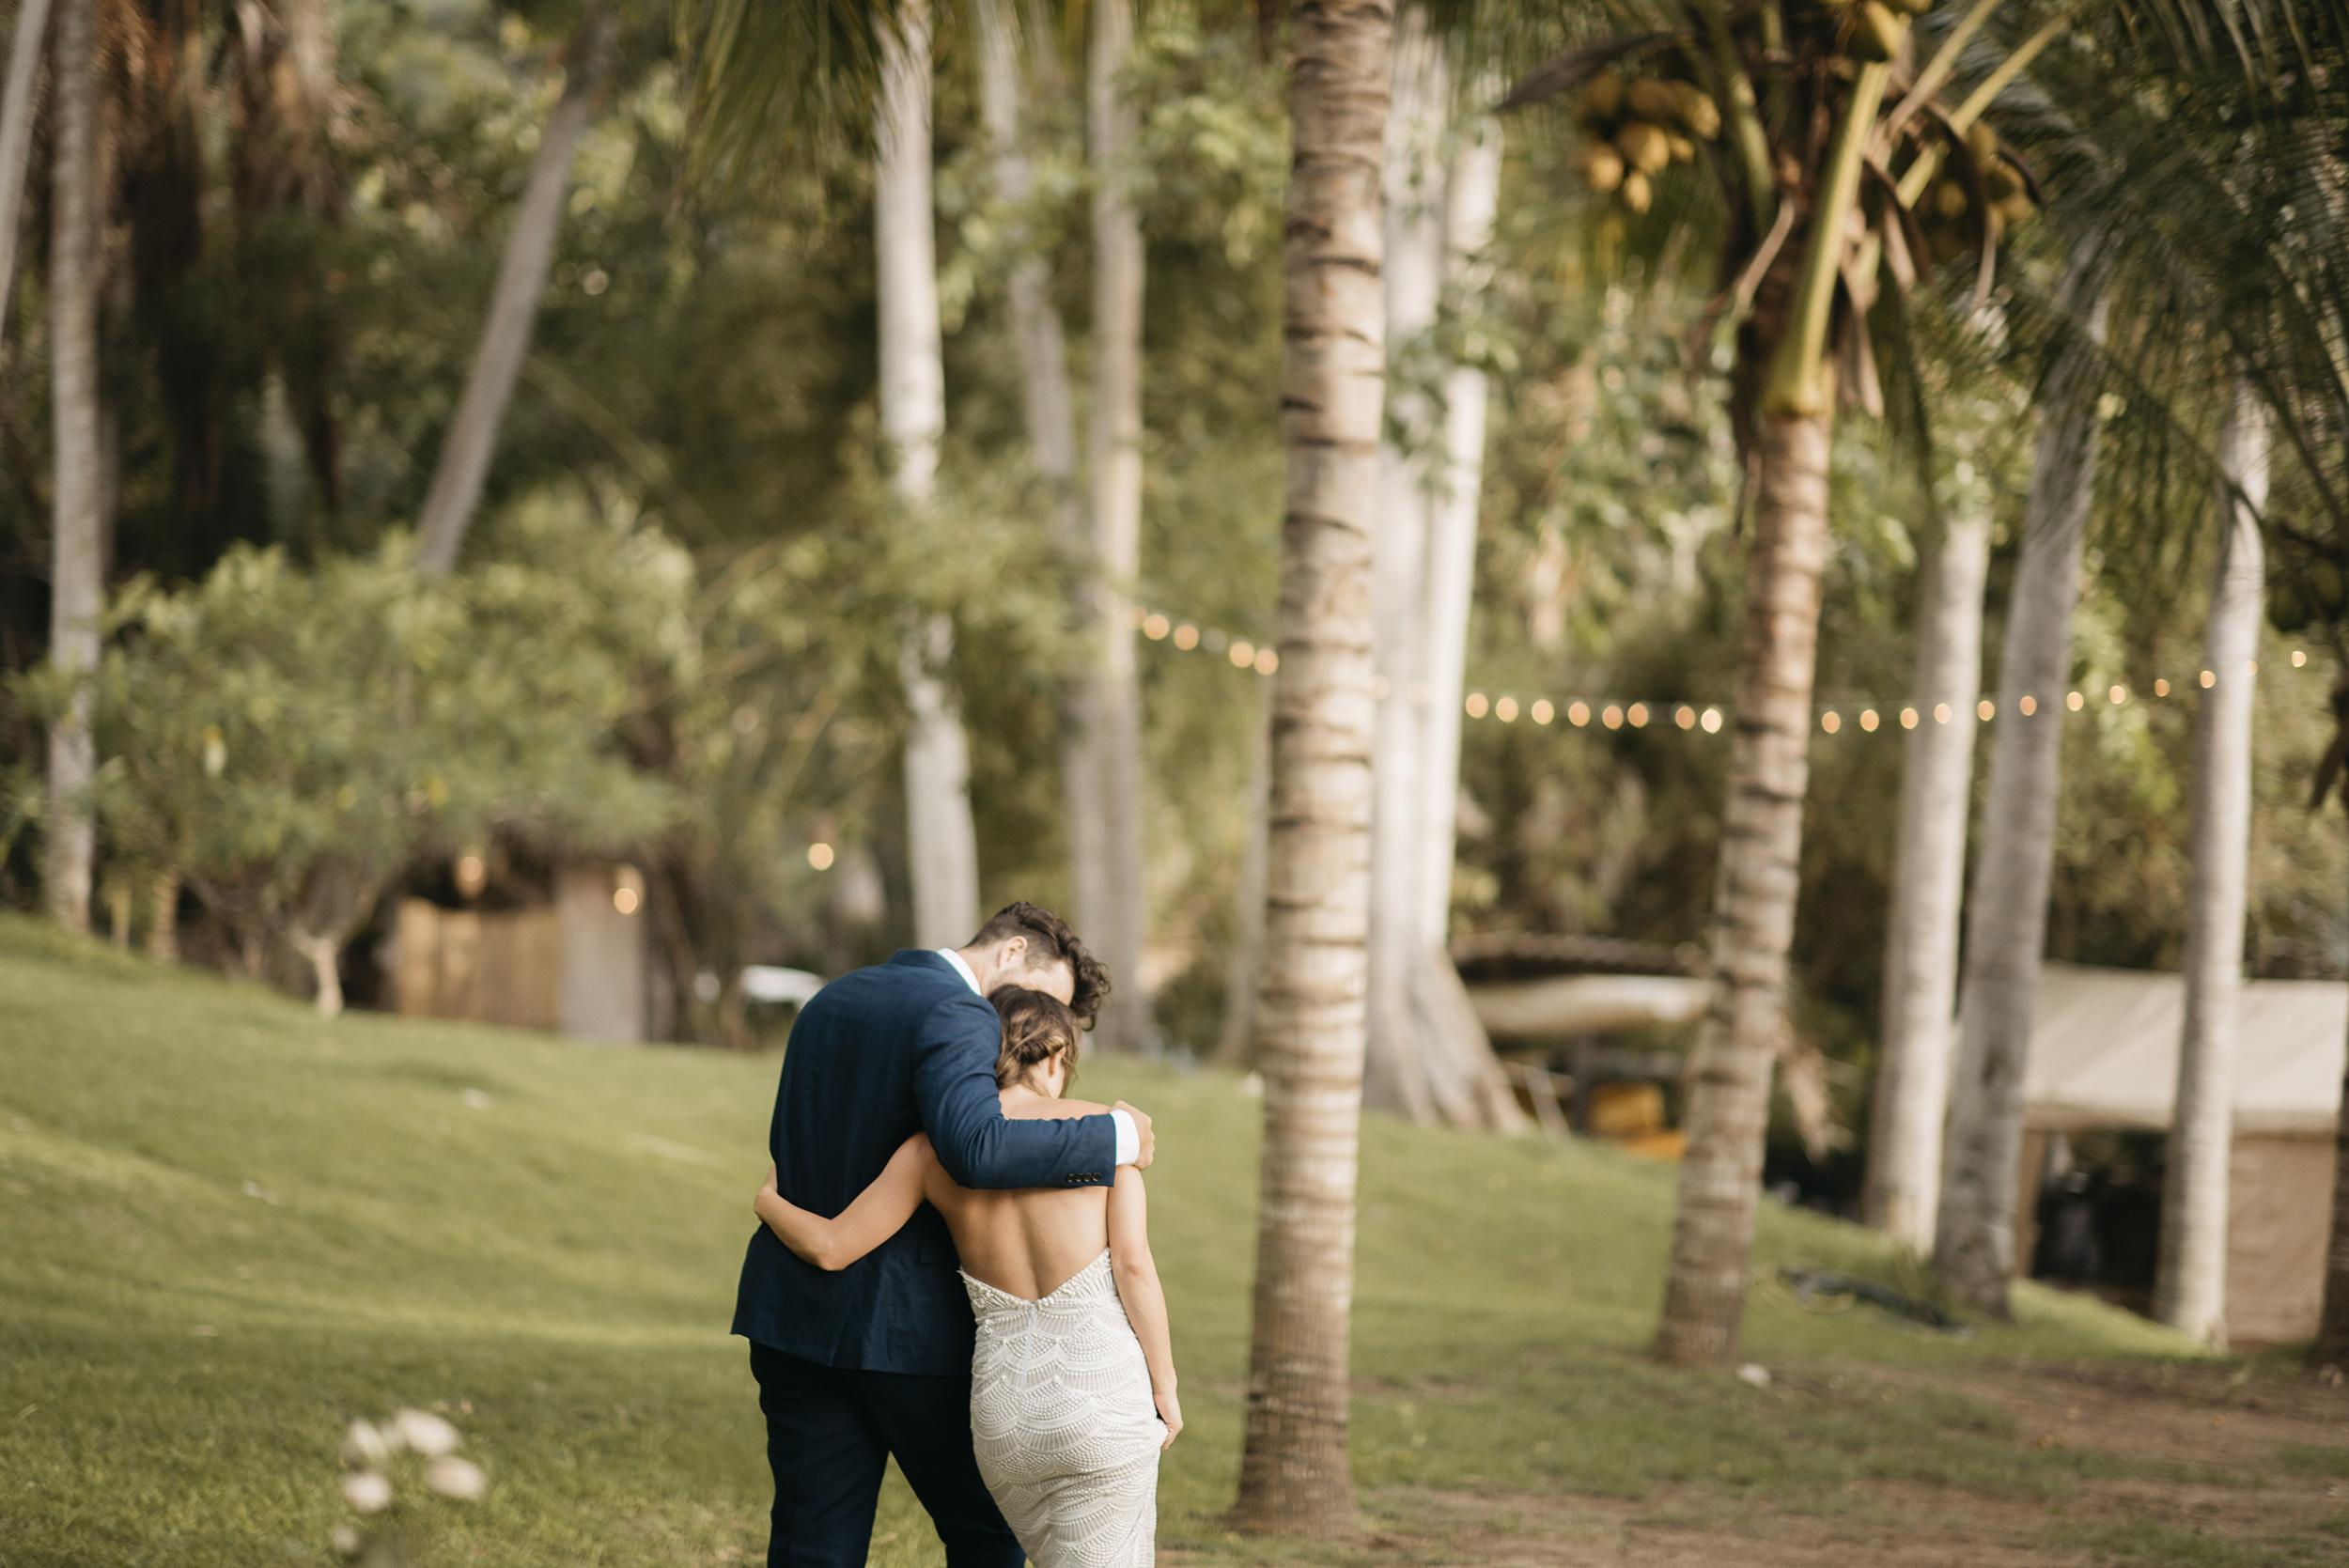 Colby-and-Jess-Intimate-Destination-Wedding-Sayulita-Puerto-Vallarta-Mexico293.jpg